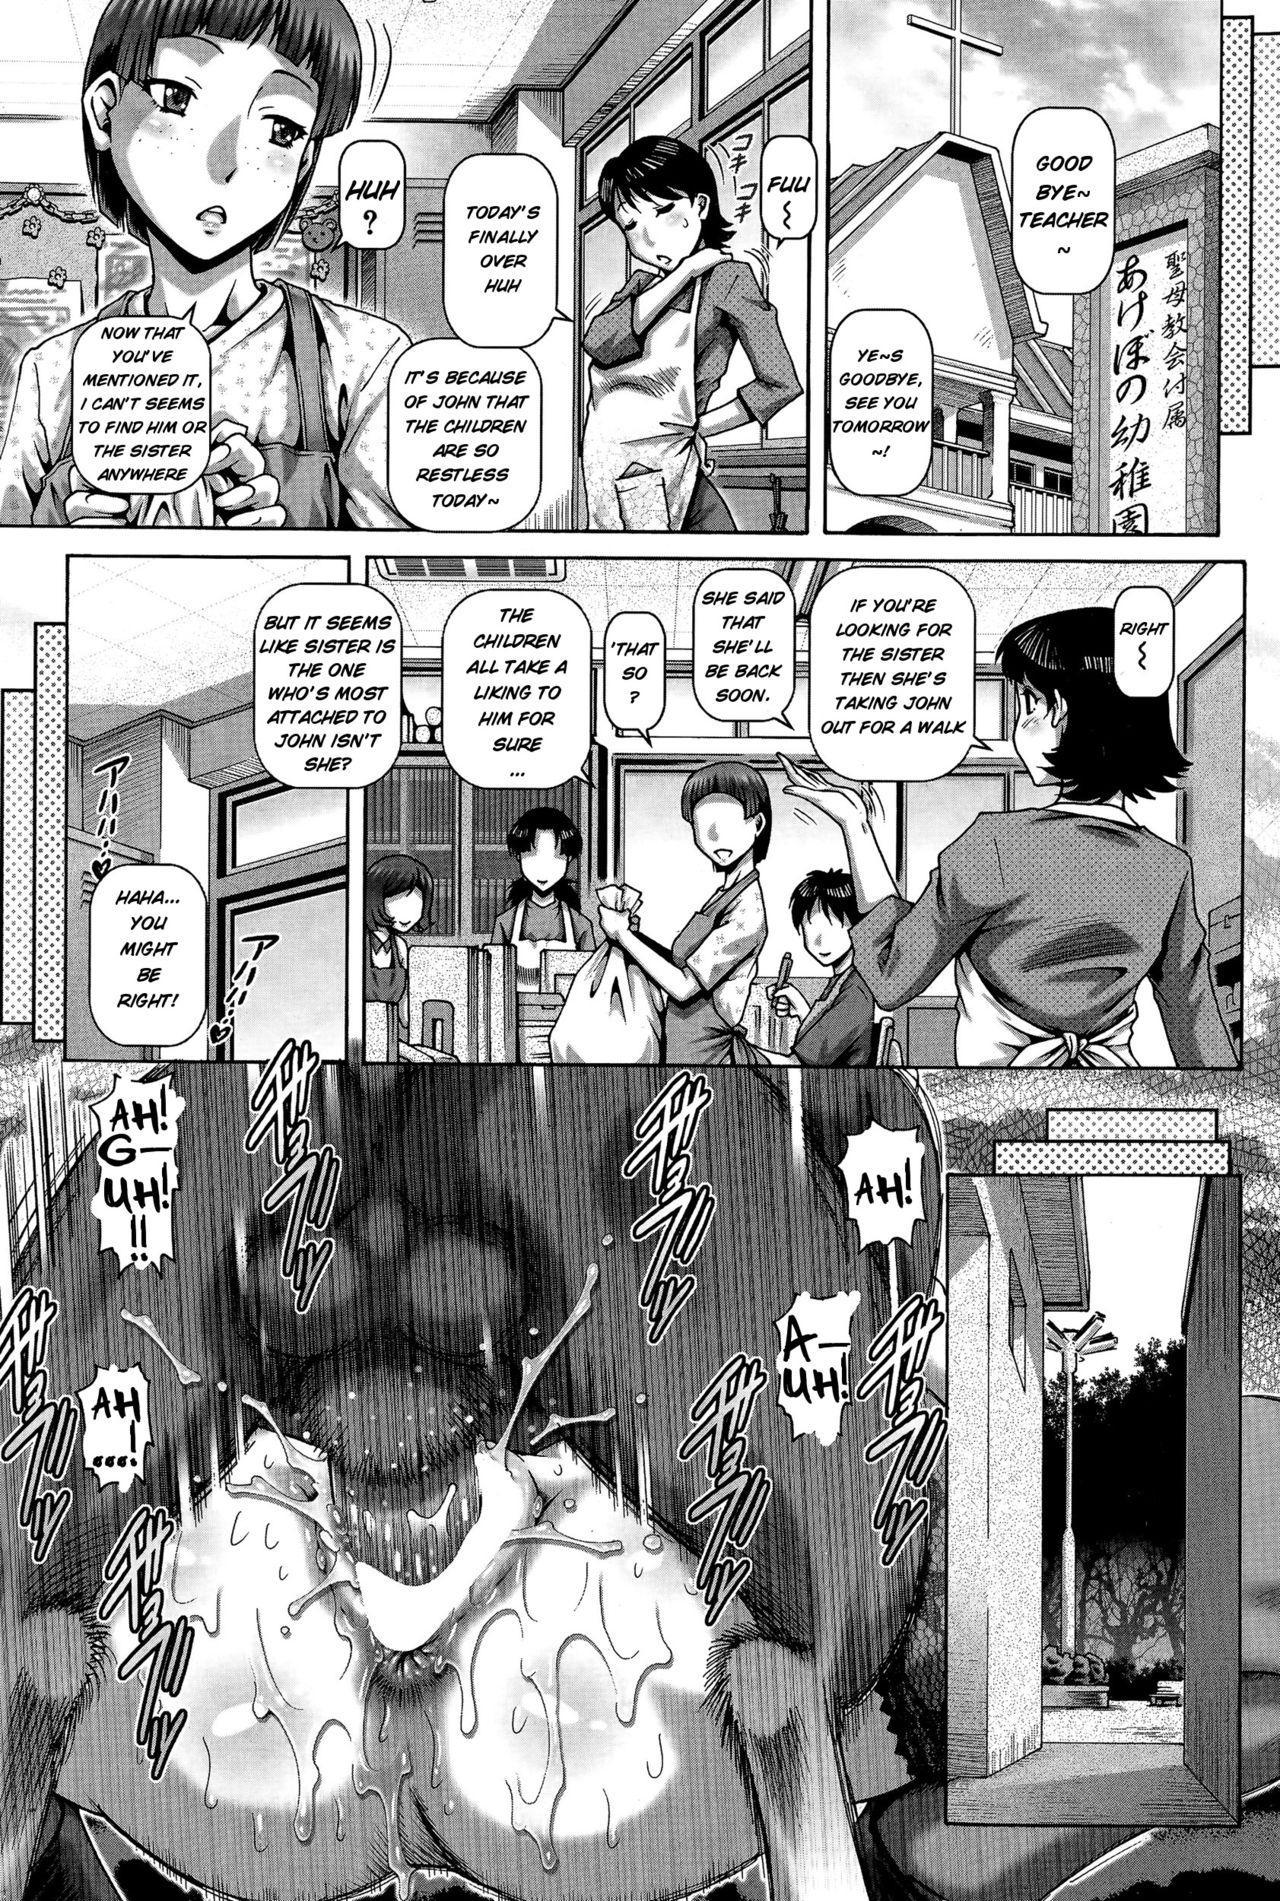 Shito no Mesu - The Apostle's Bitch 21